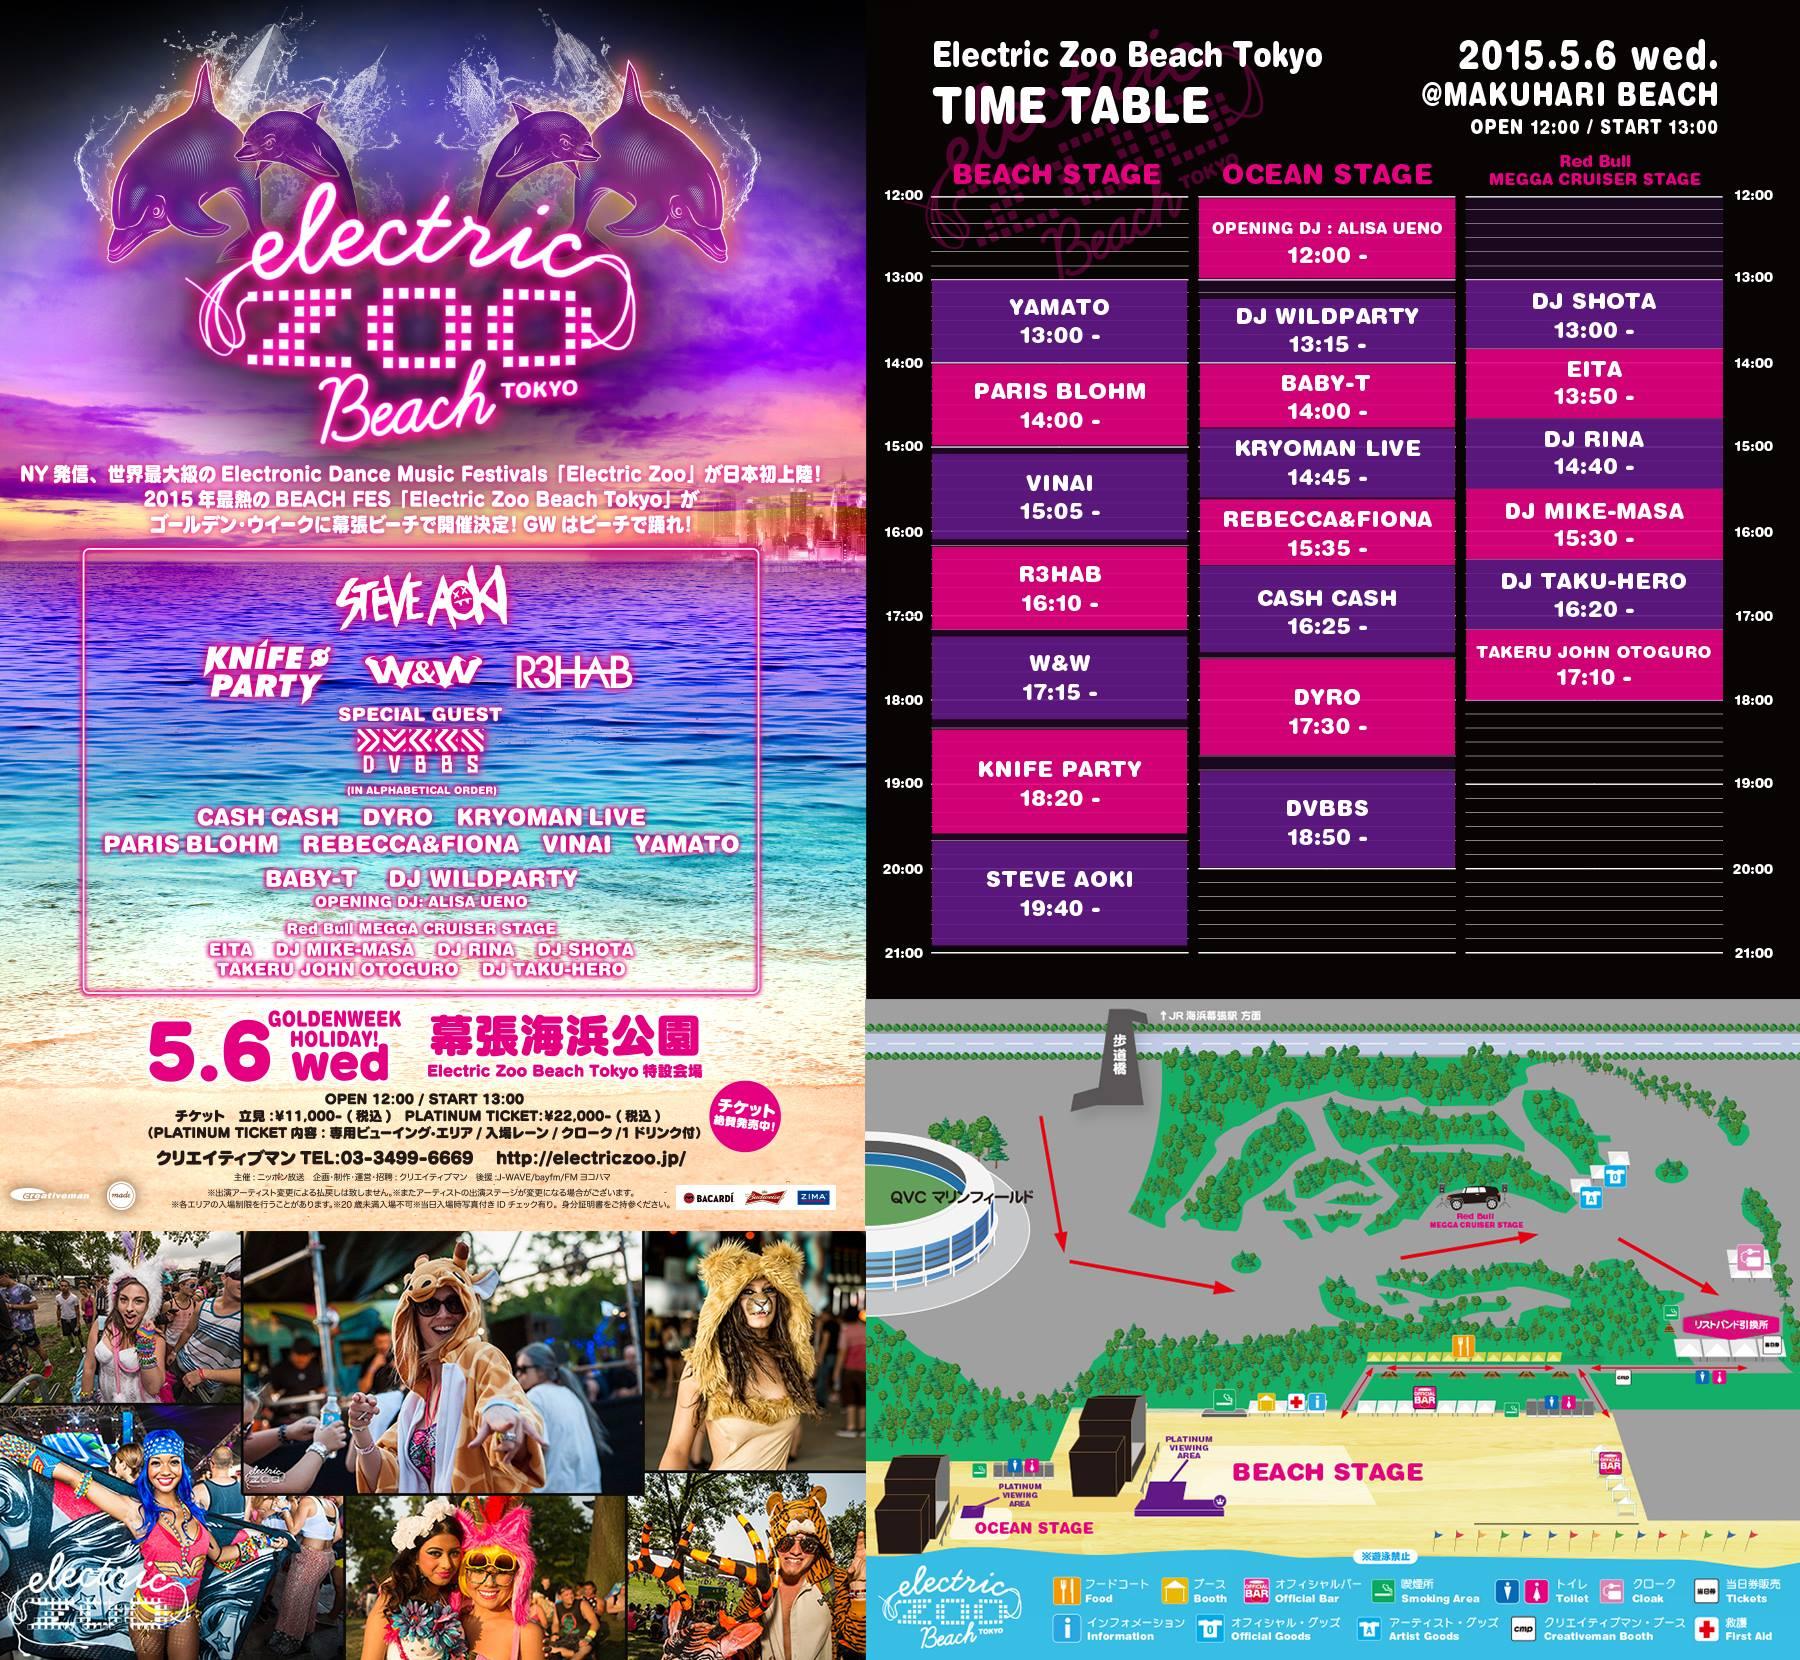 Electric Zoo Tokyo Beach 2015